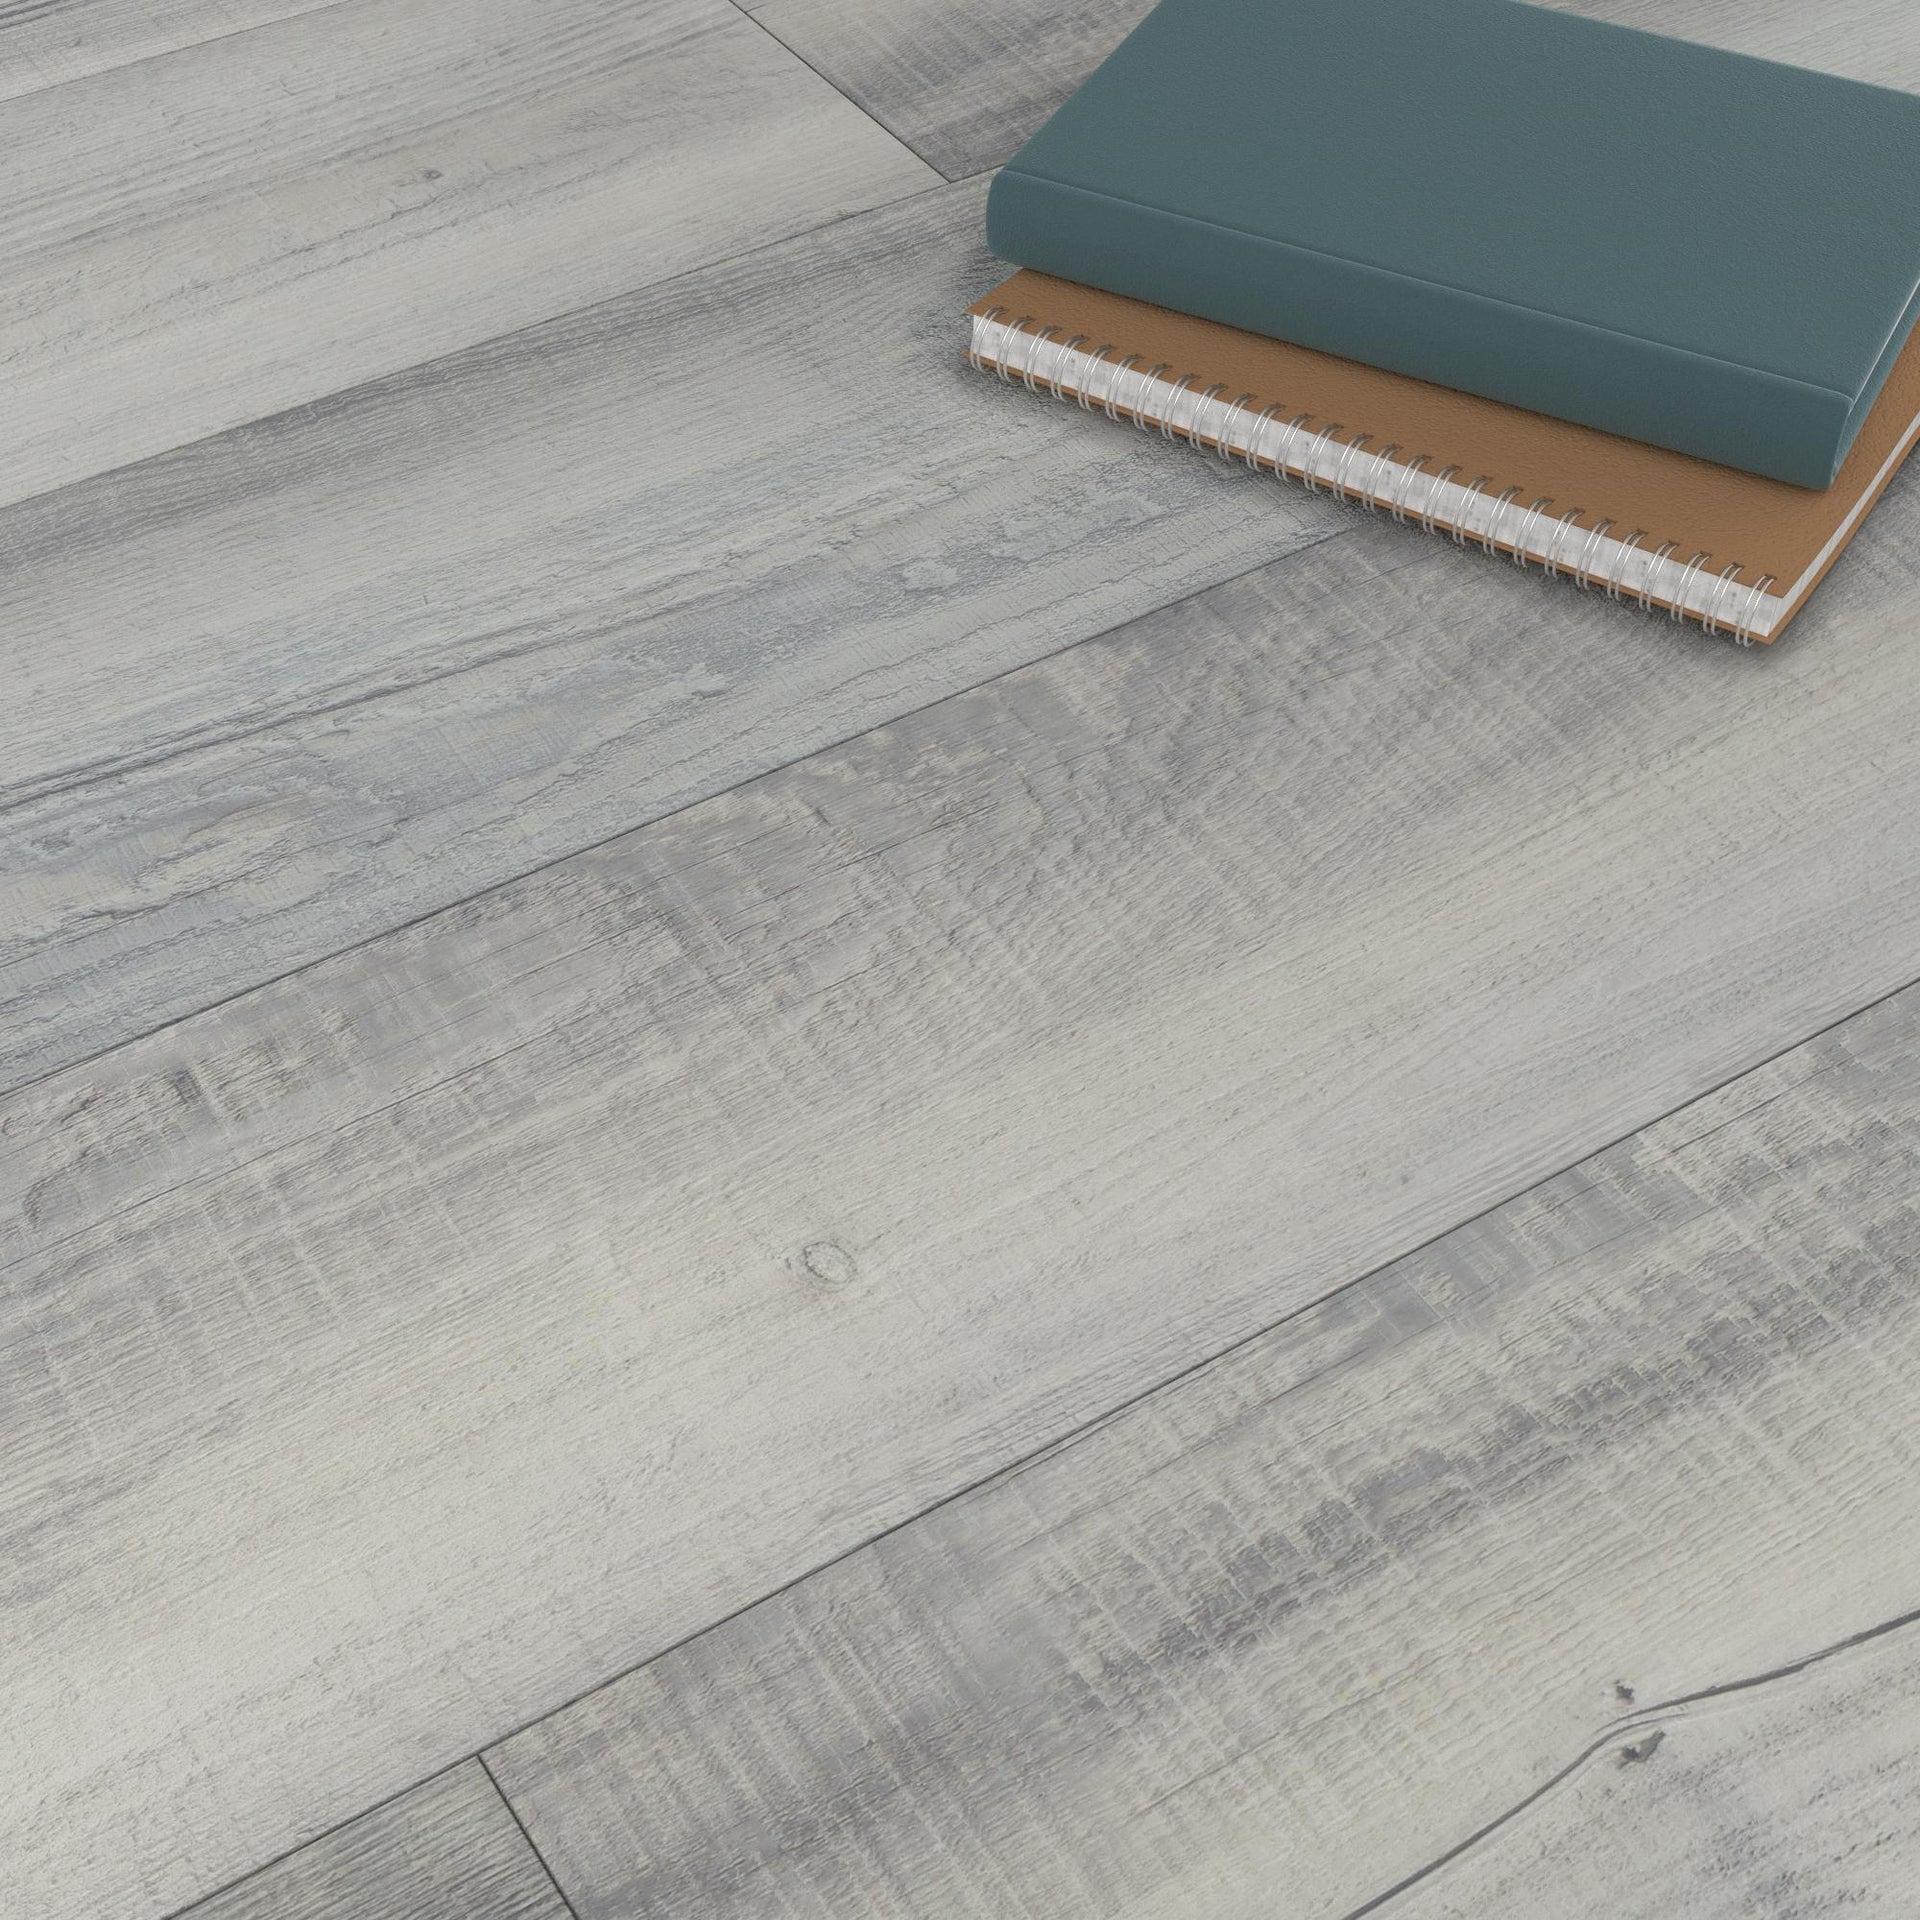 Plancia di vinile flottante clic+ Solor Sp 5 mm grigio / argento - 6